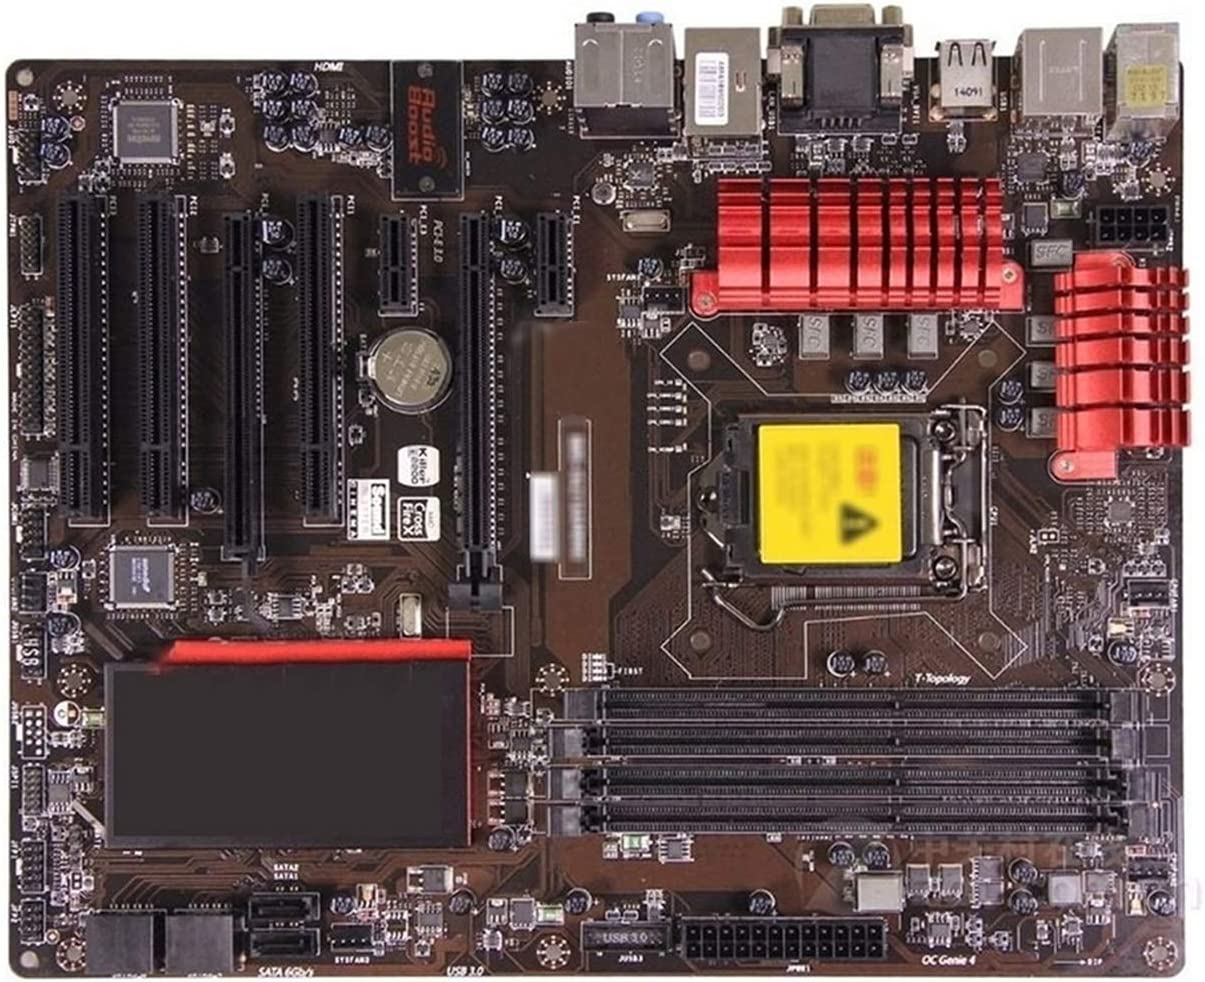 RKRLJX Placa Madre Micro ATX MOTORBOART MADERBOOM MADERBARD Fit For para MSI B85-G43 Gaming DDR3 LGA 1150 32GB Ajuste para 22NM CPU USB3.0 DVI VGA HDMI